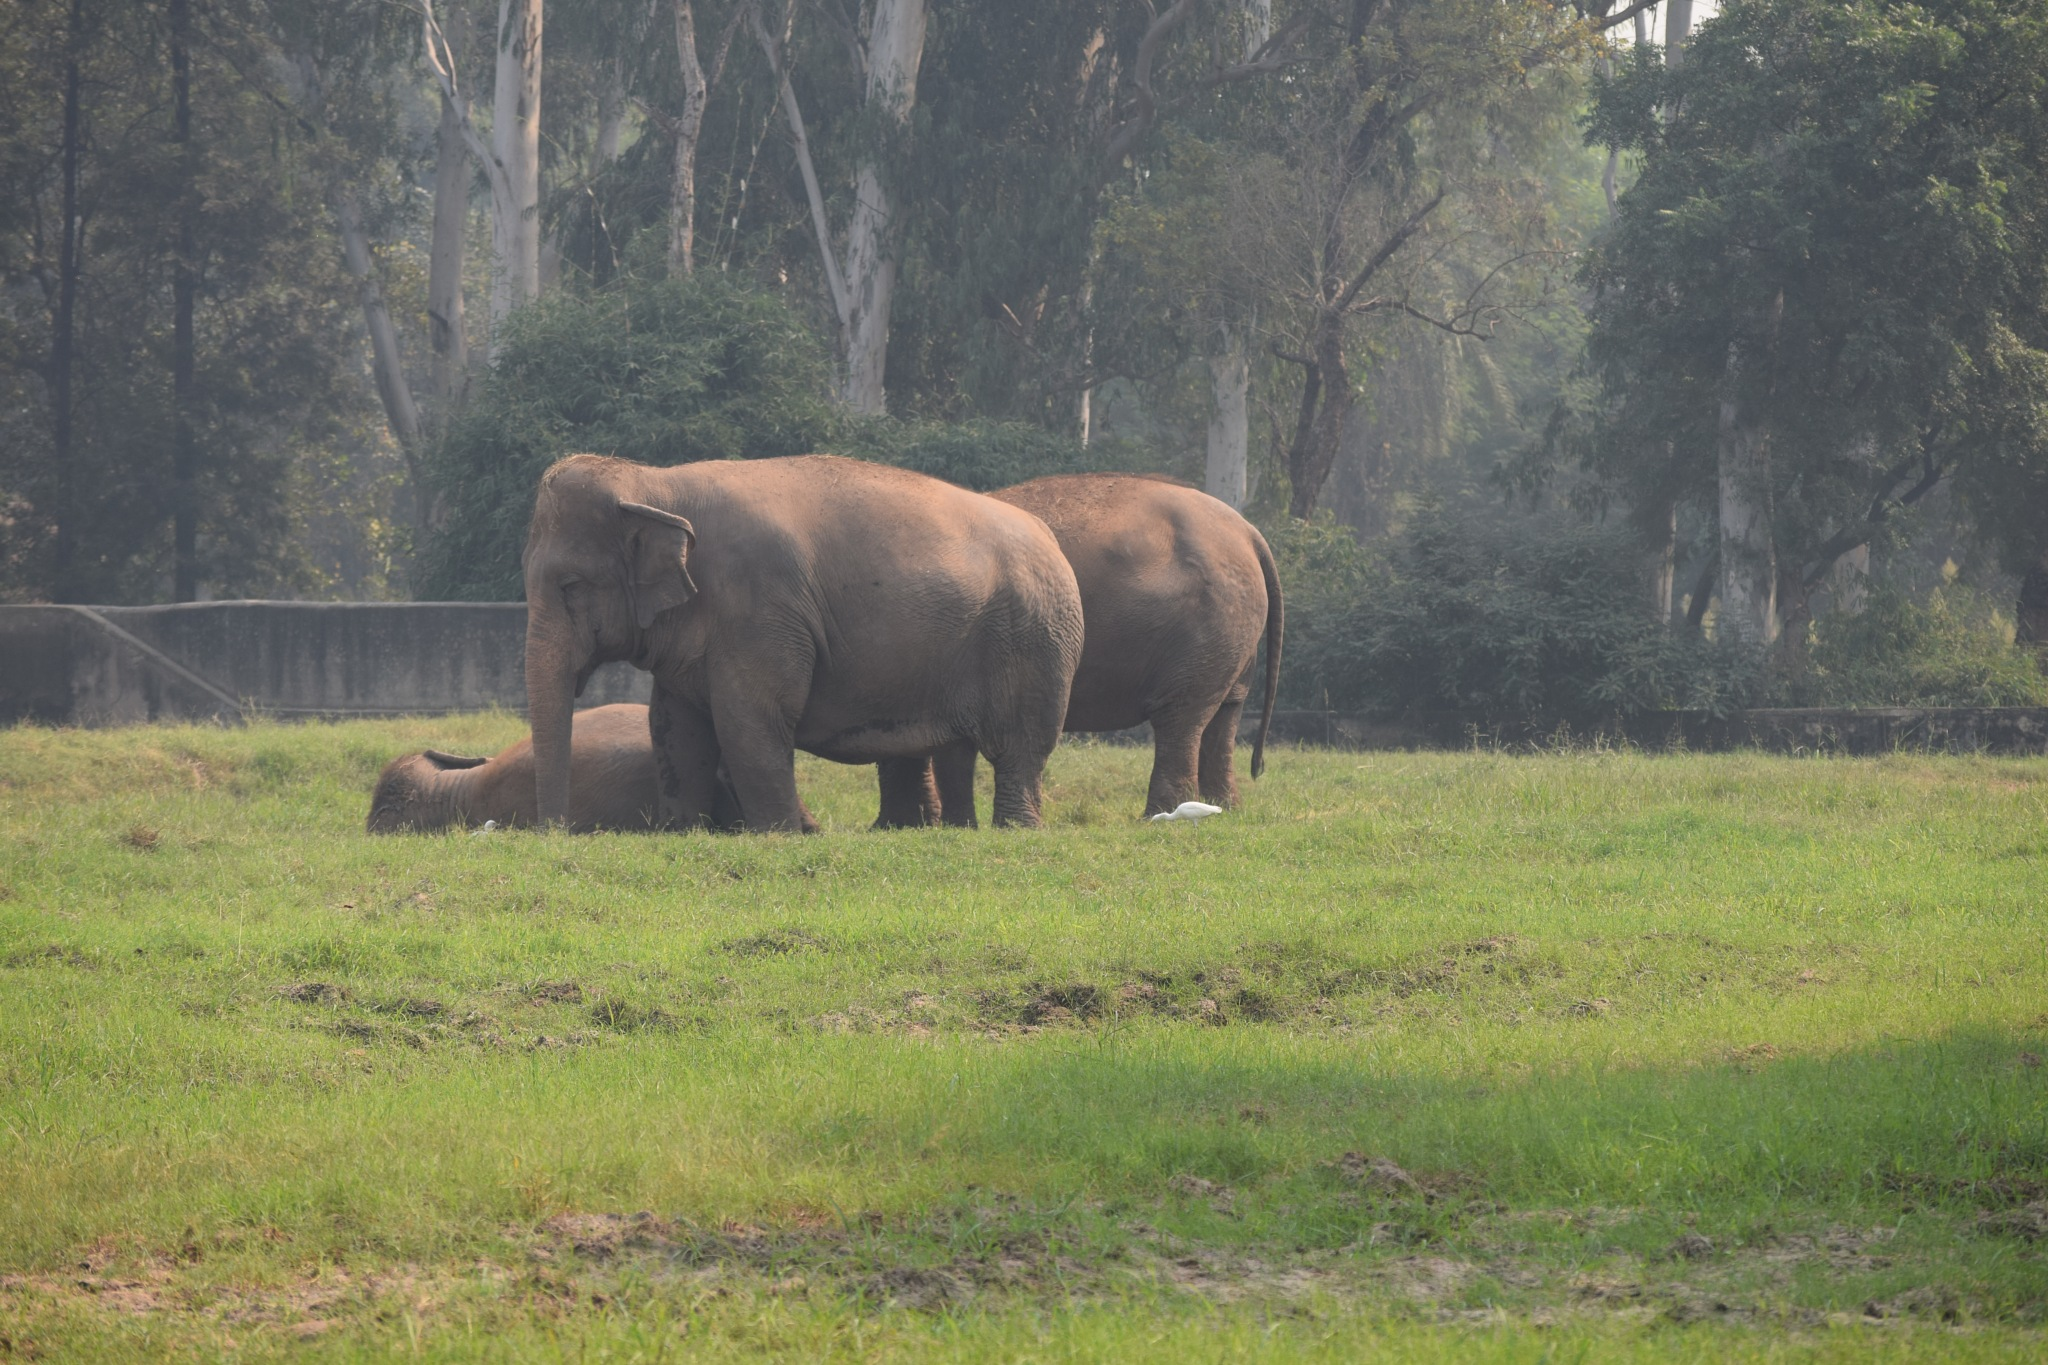 Elephants by Sumit Jhamb